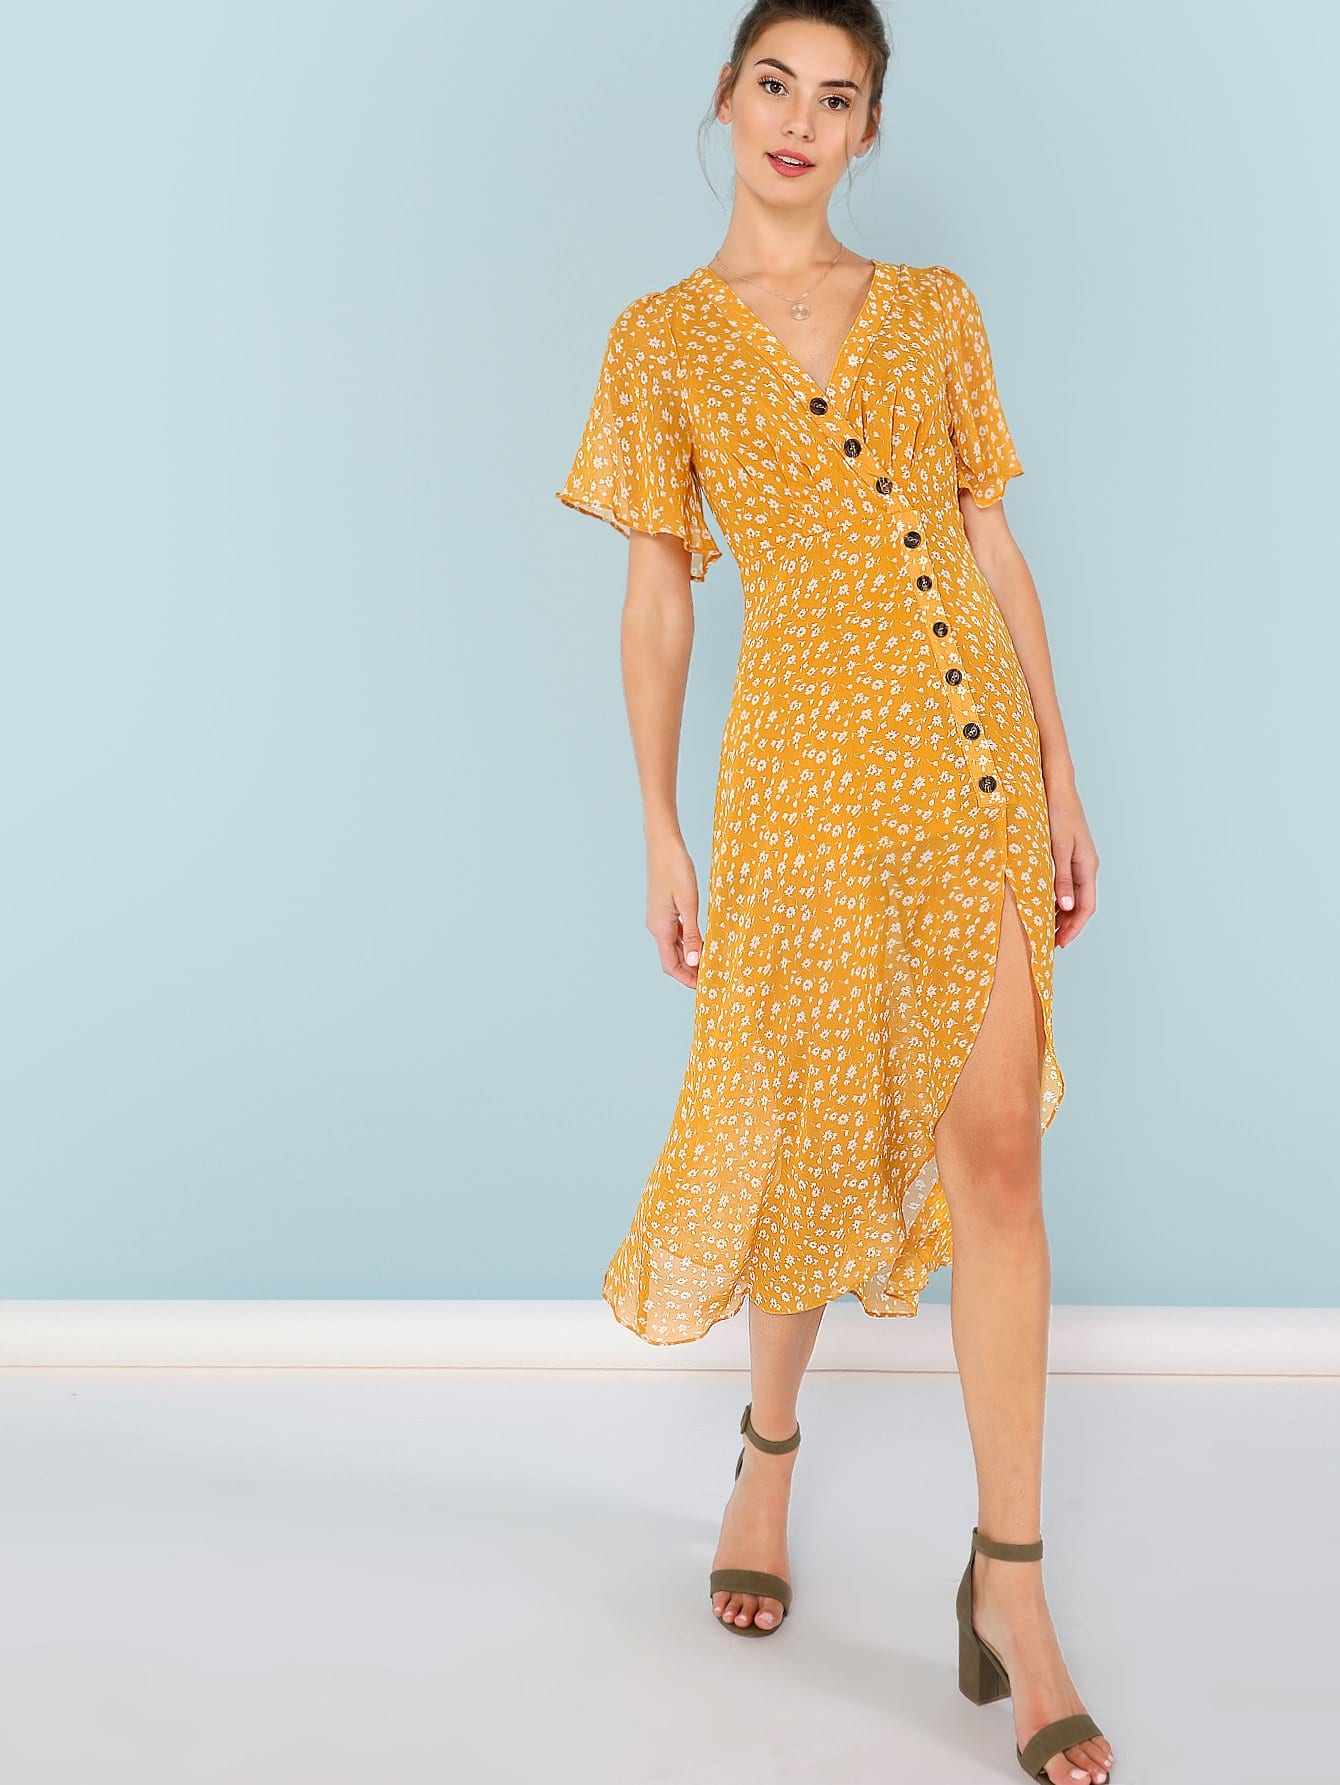 Купить Асимметричный пуговичный флоп-платье, Zandria Theis, SheIn